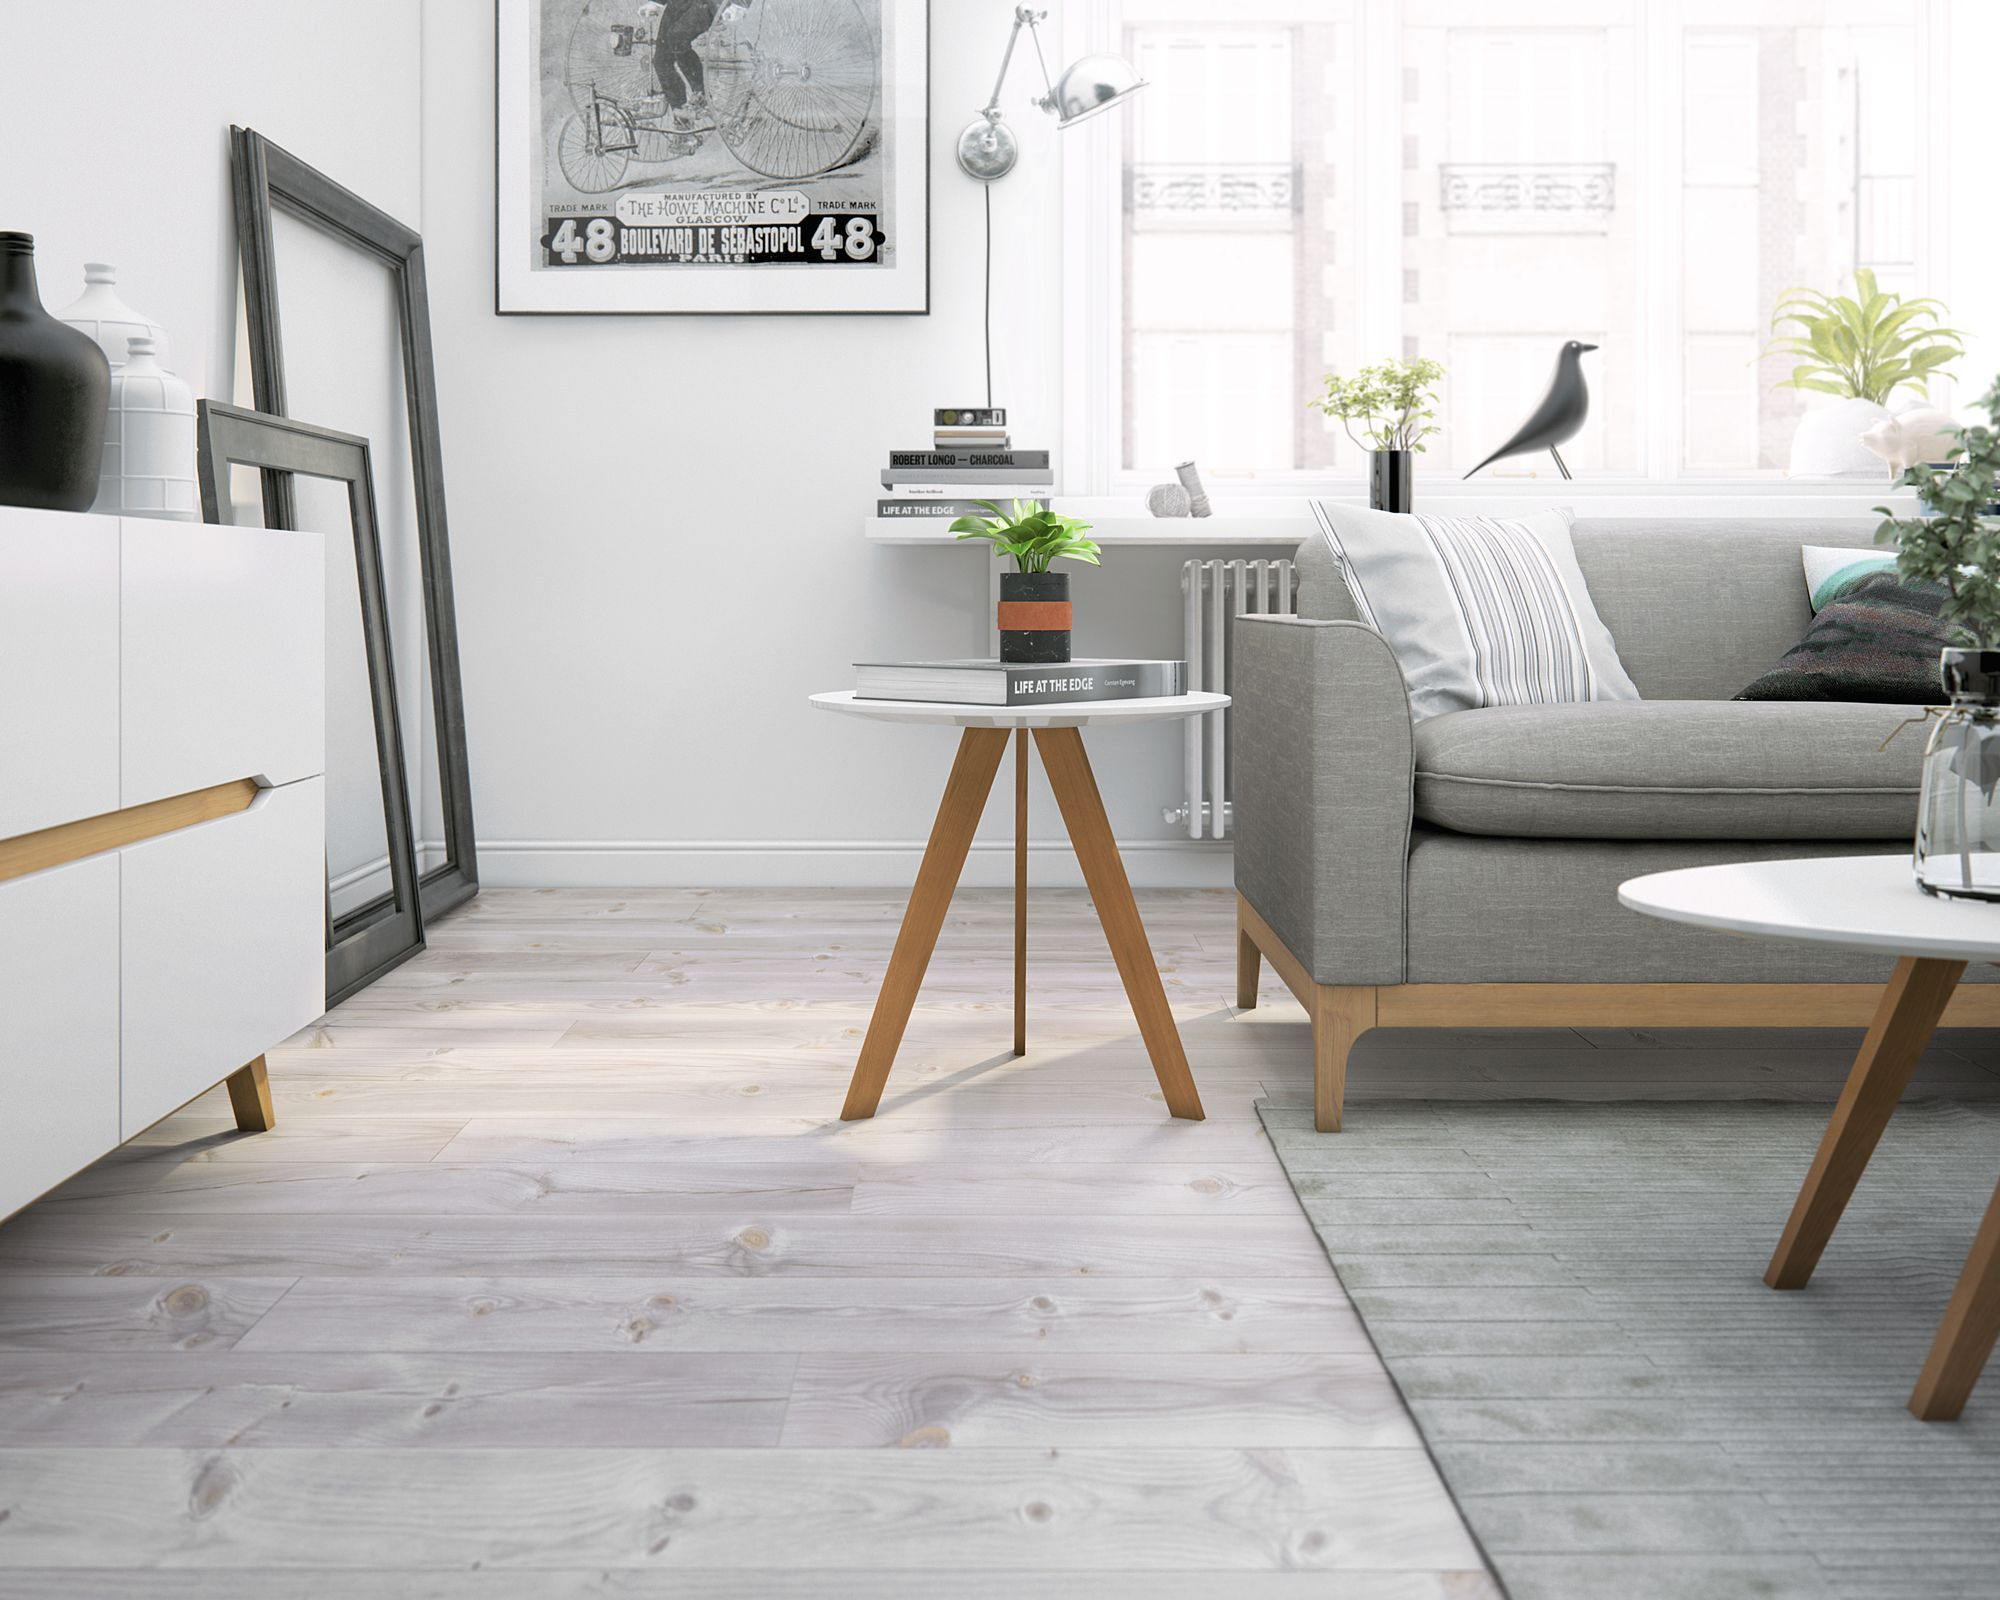 Loren Sofa Rove Kure Scandinavian Design White Side Tables Sofa Scandinavian Style Home Decor